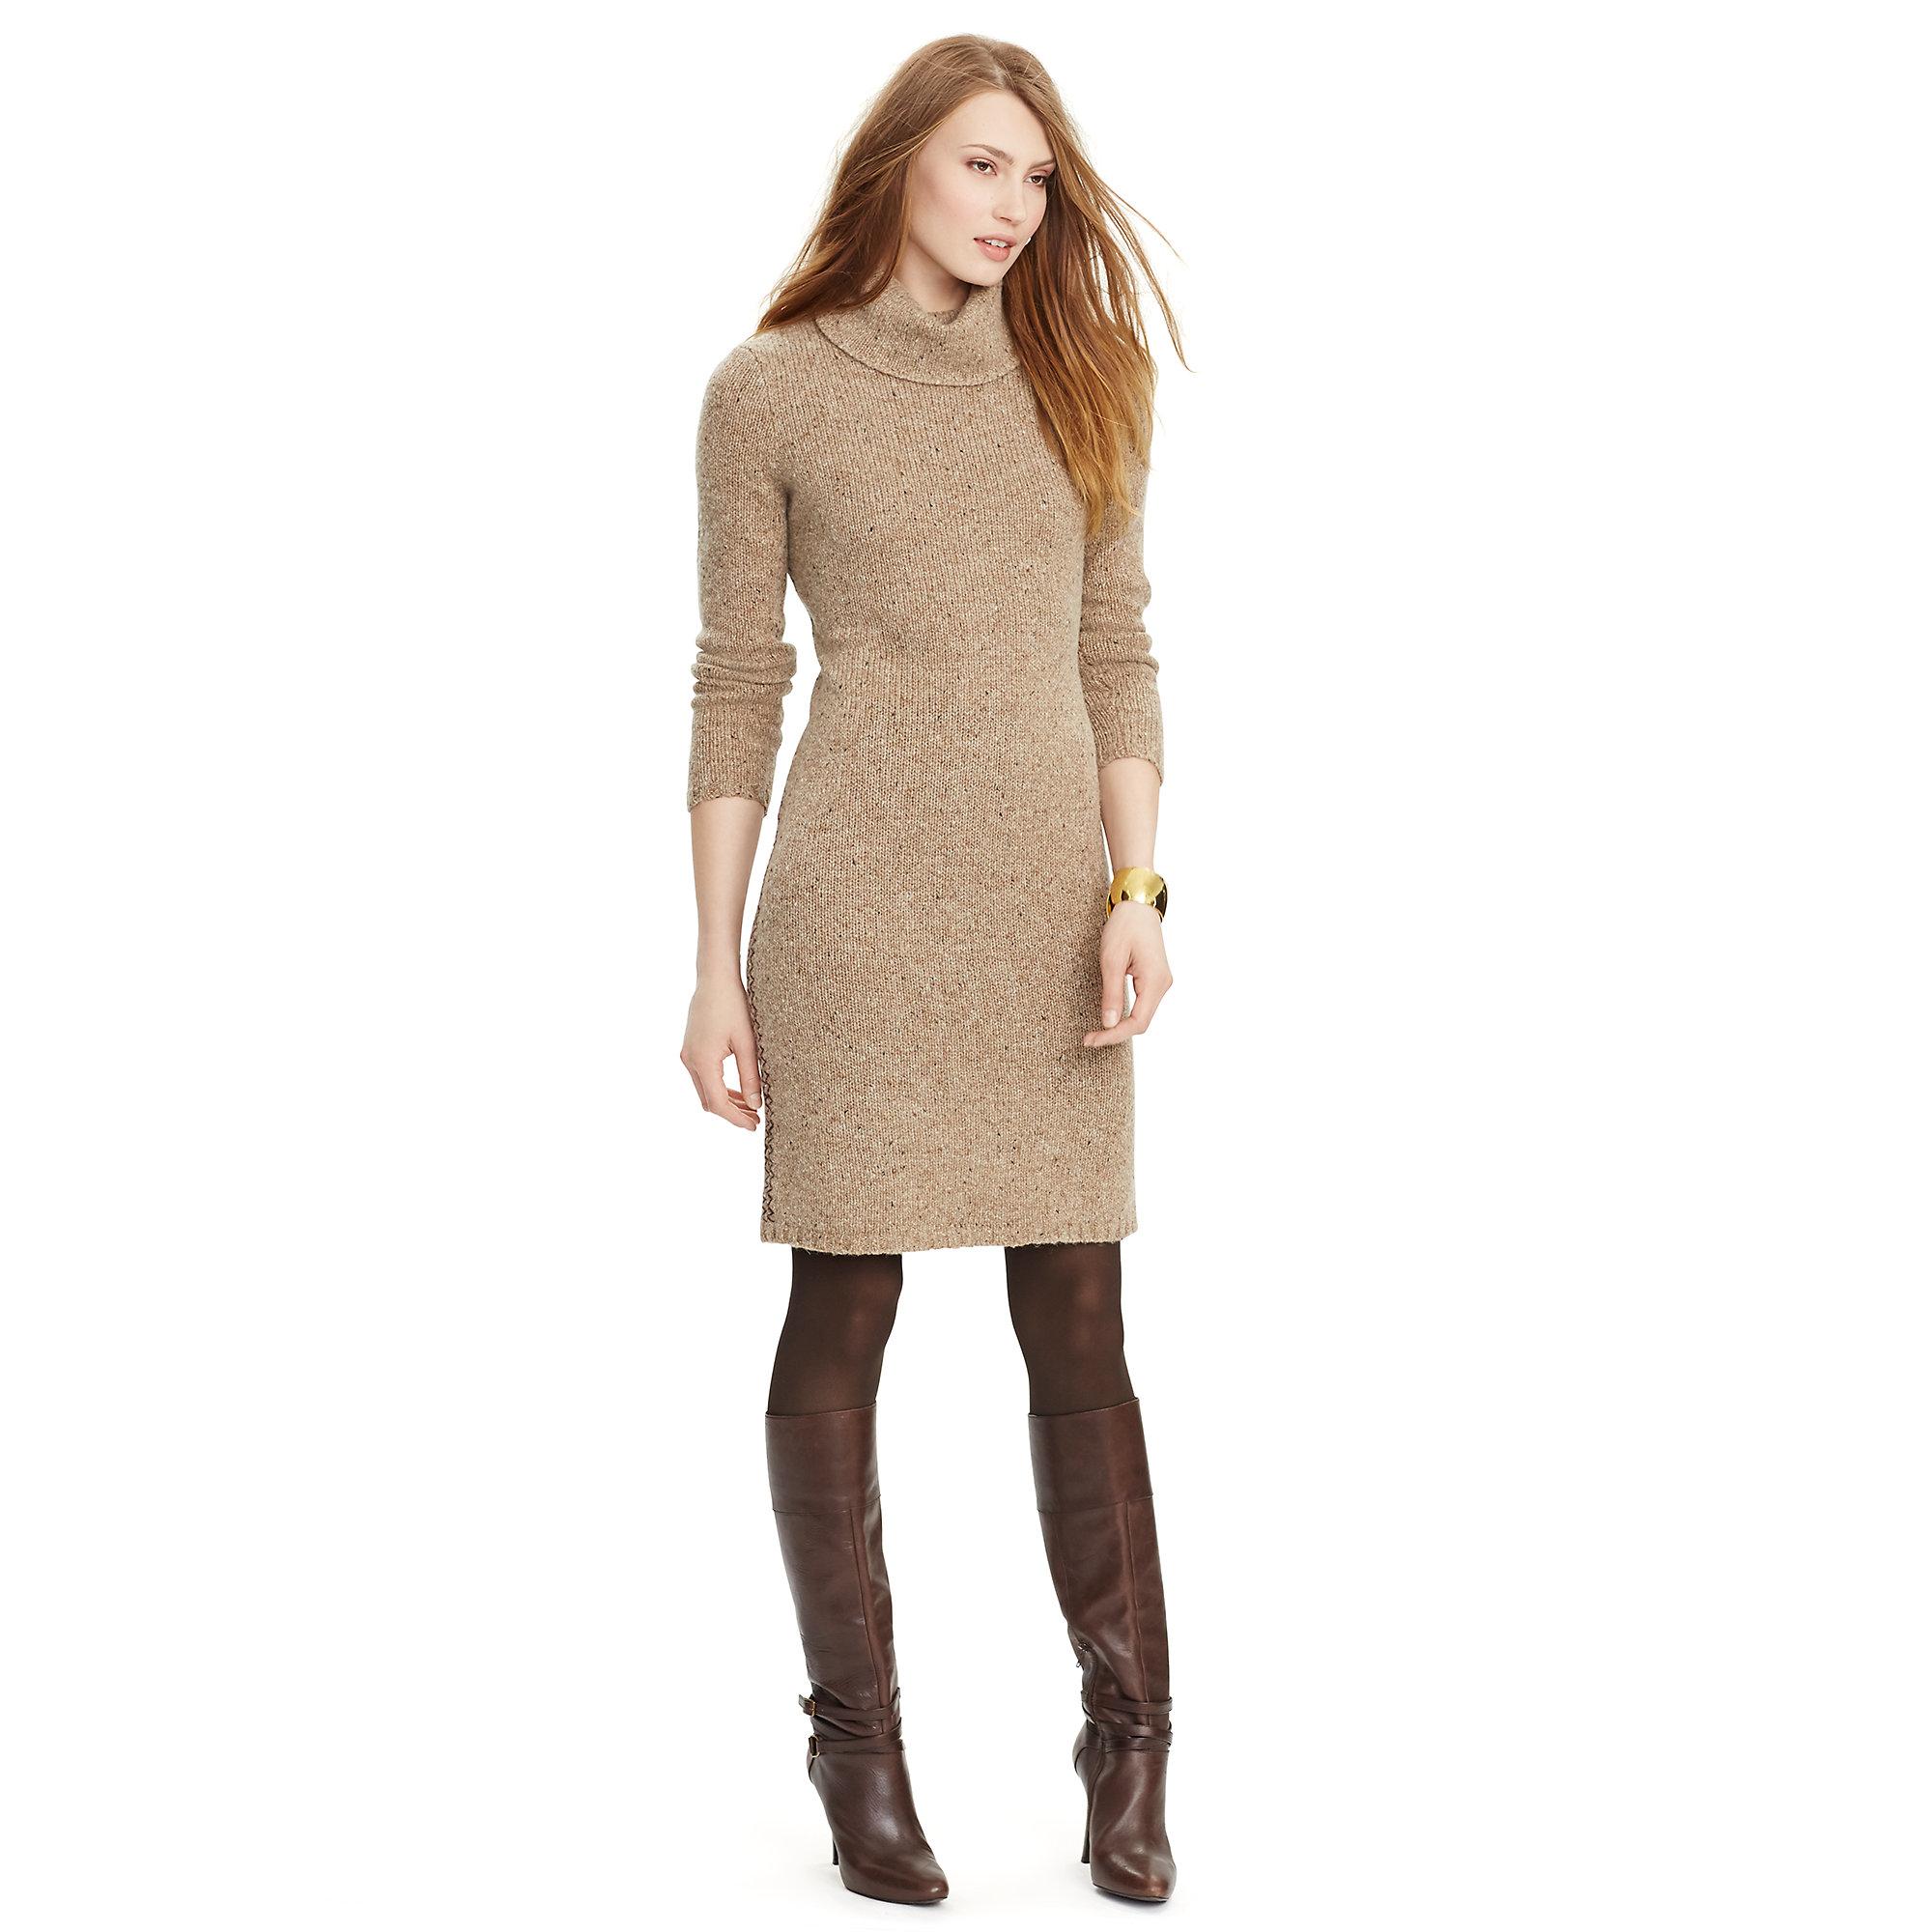 Ralph lauren Turtleneck Sweater Dress in Natural   Lyst